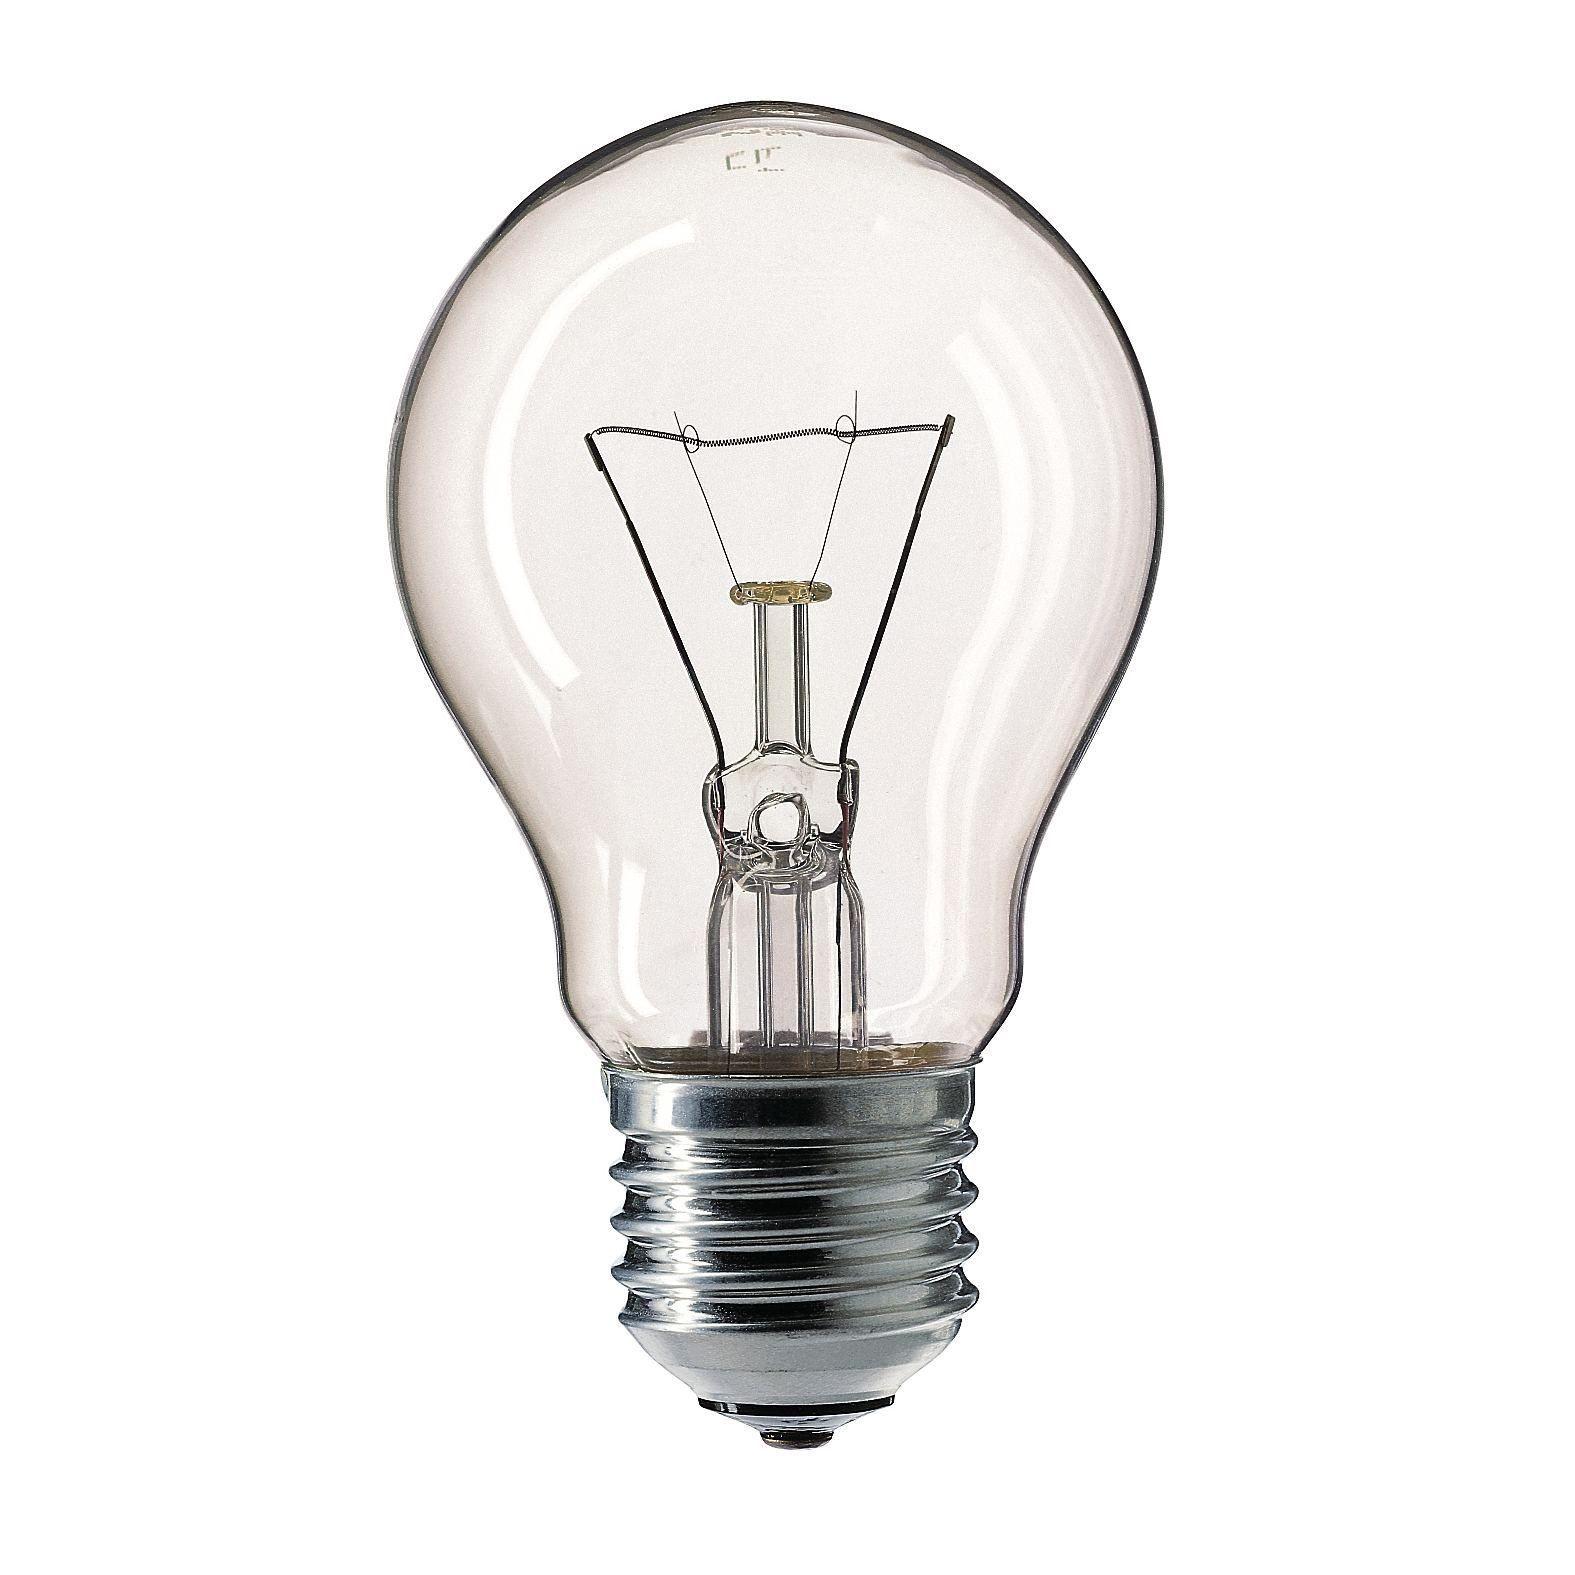 Купить Лампа накаливания Philips A55 75W 230V E27 CL.1CT/12X10F Pila прозрачная